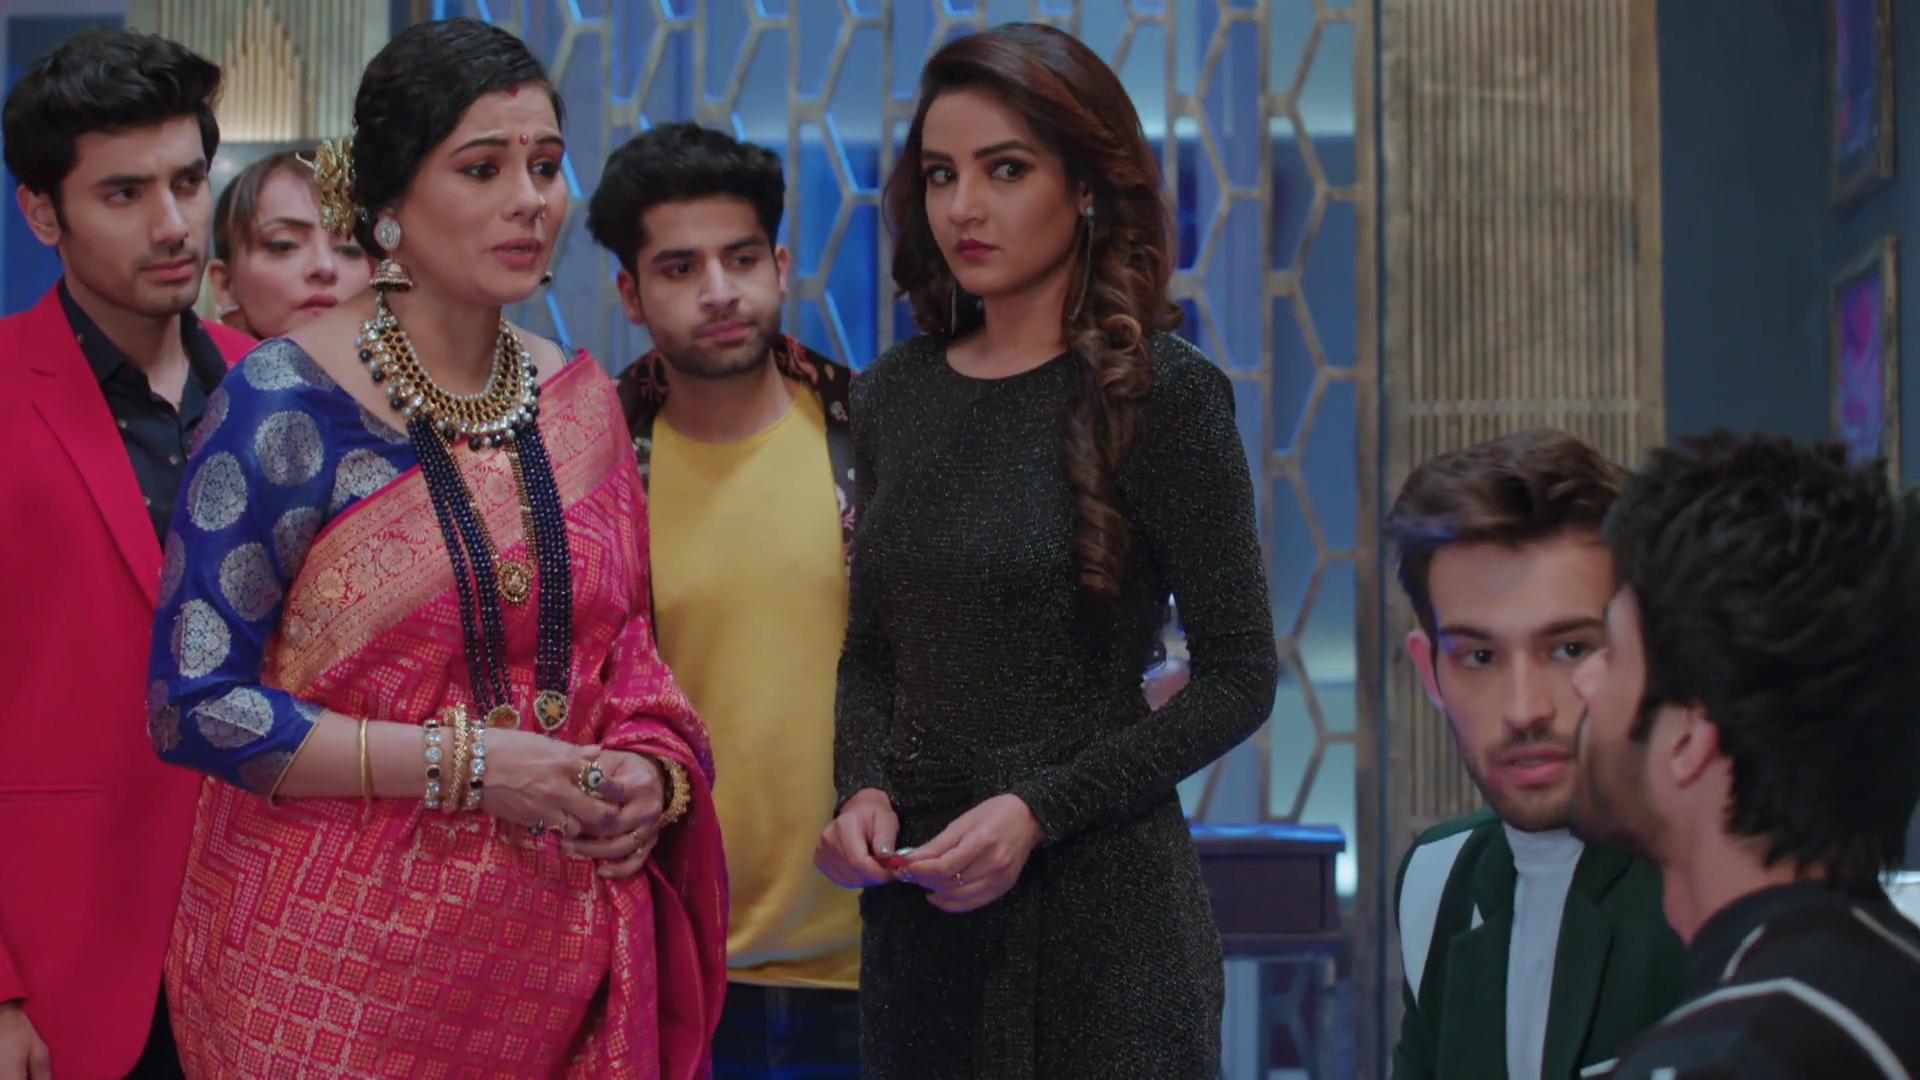 Rakhee Tandon, Jasmin Bhasin, and Geetanjali Tikekar in Episode #4.4 (2019)